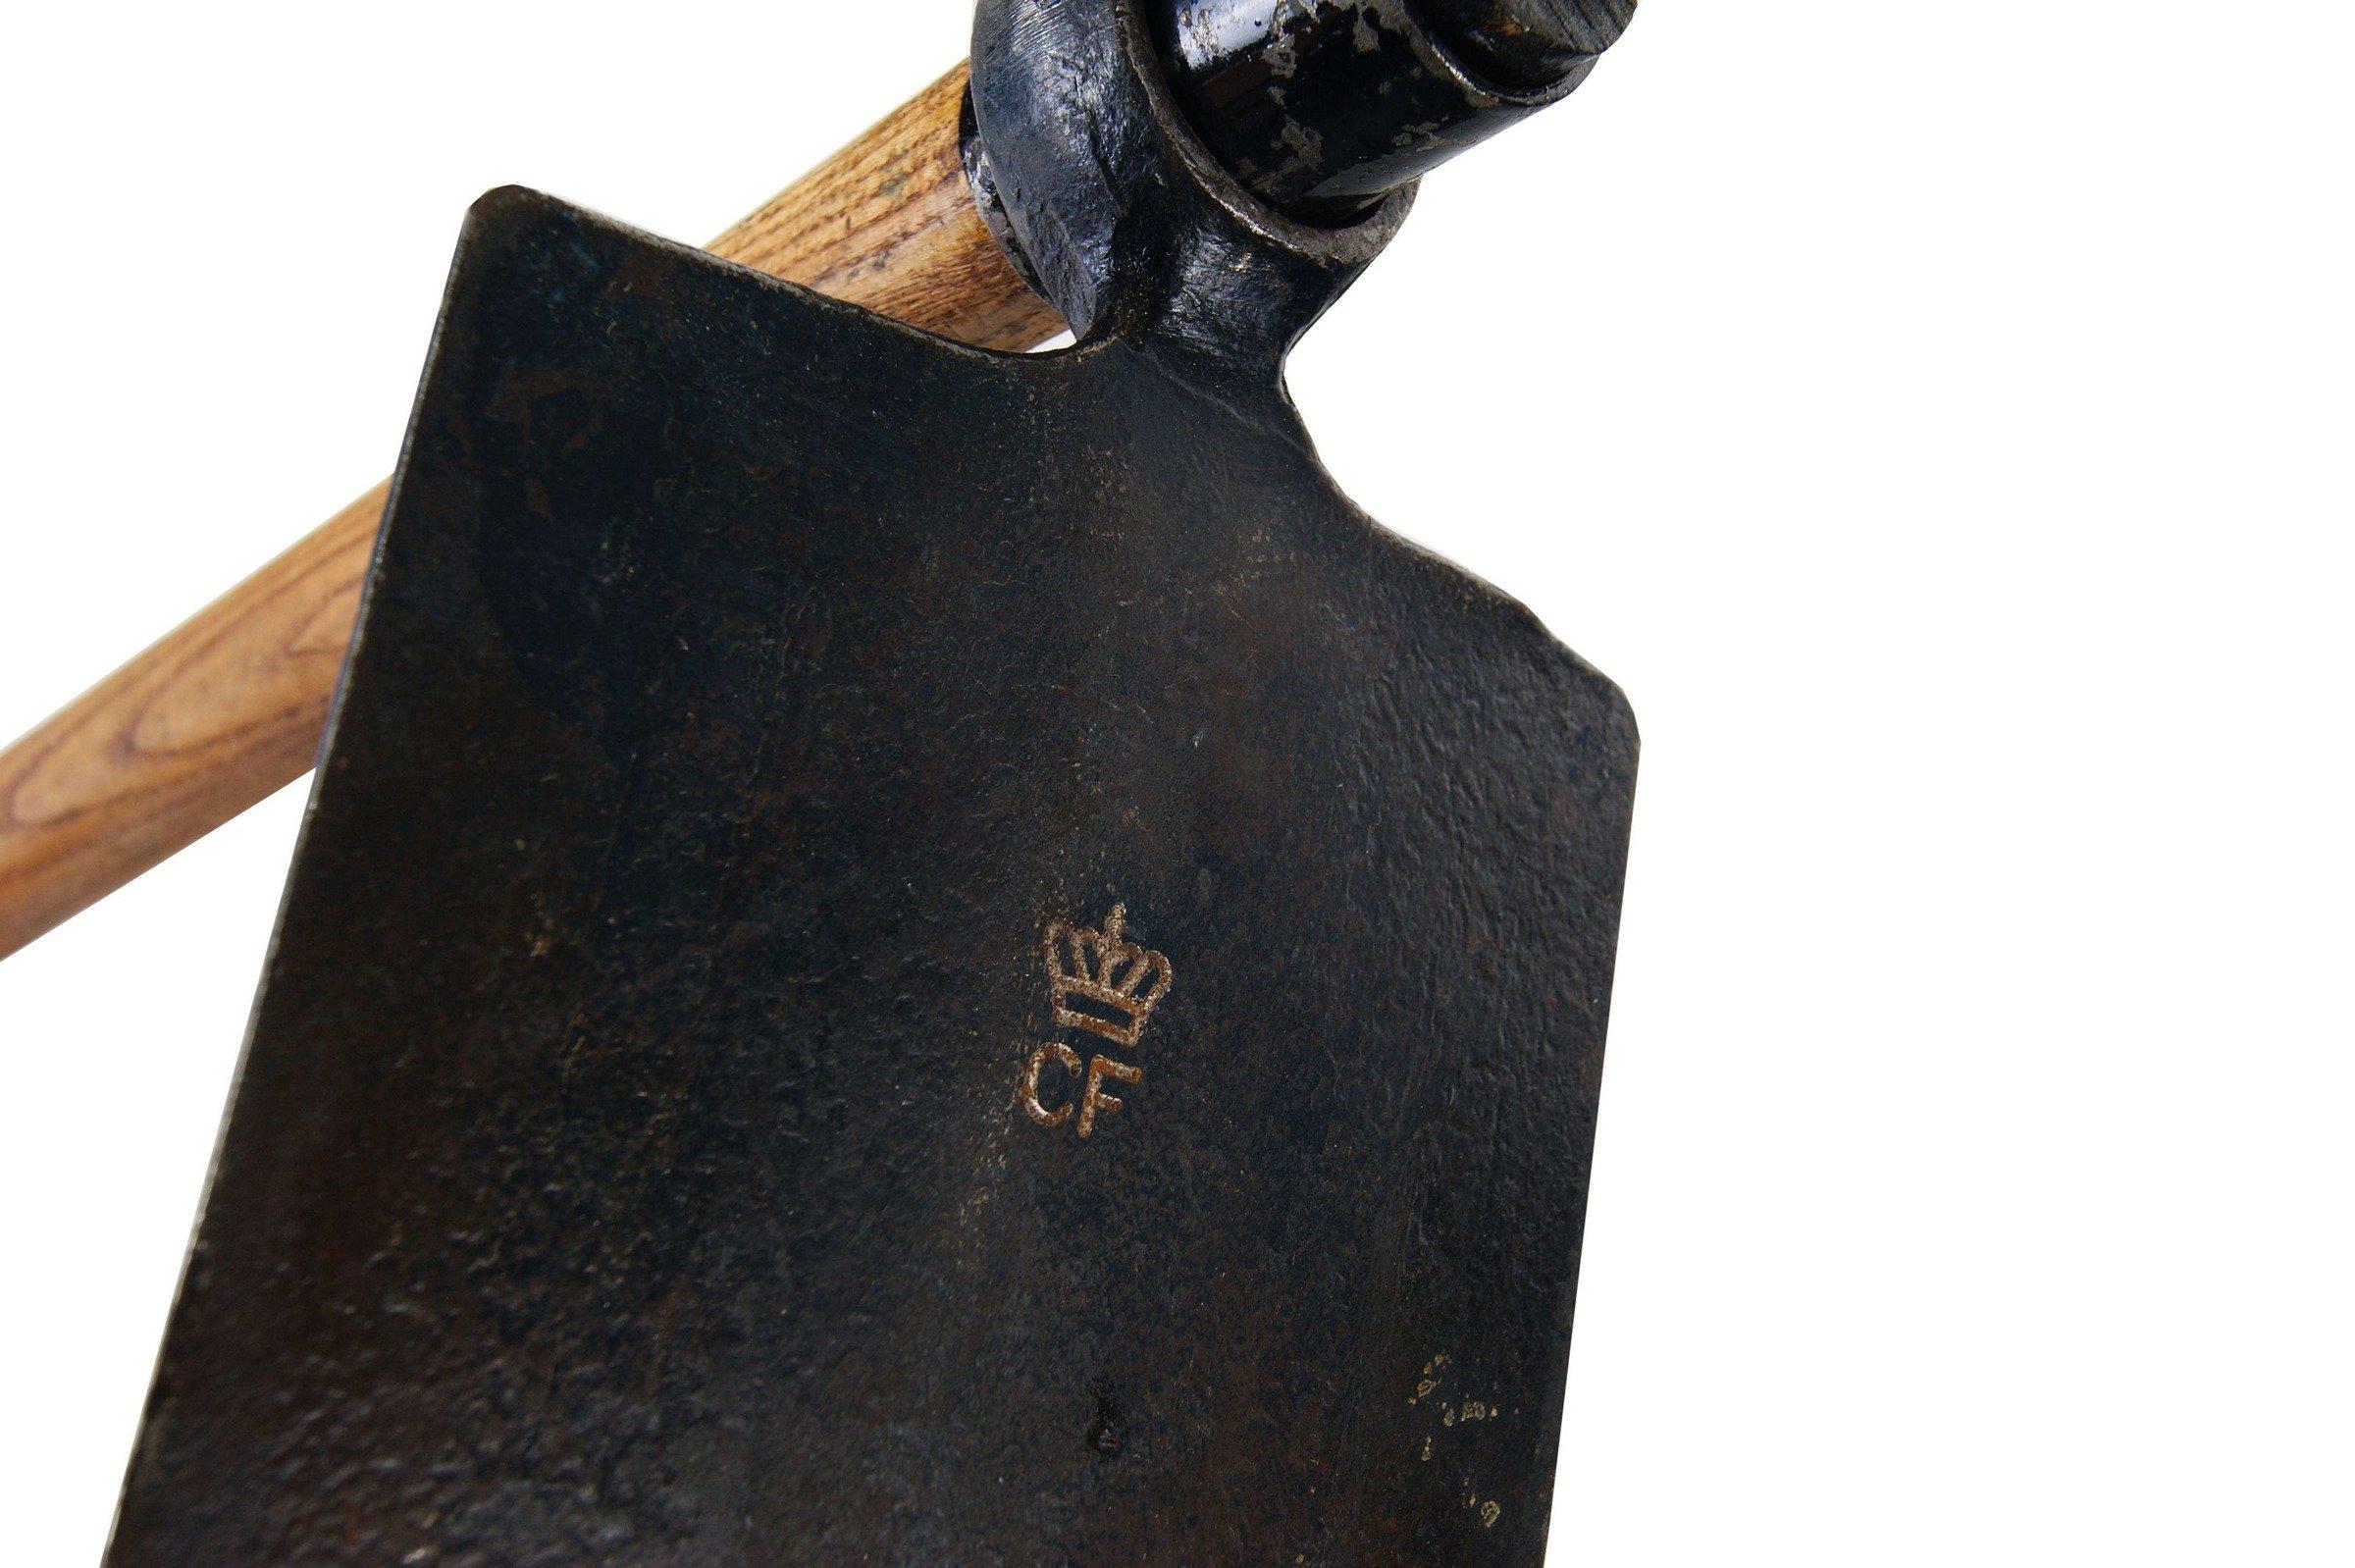 P37 Entrenching tool - original WW2 item 47,25 €   Nestof pl